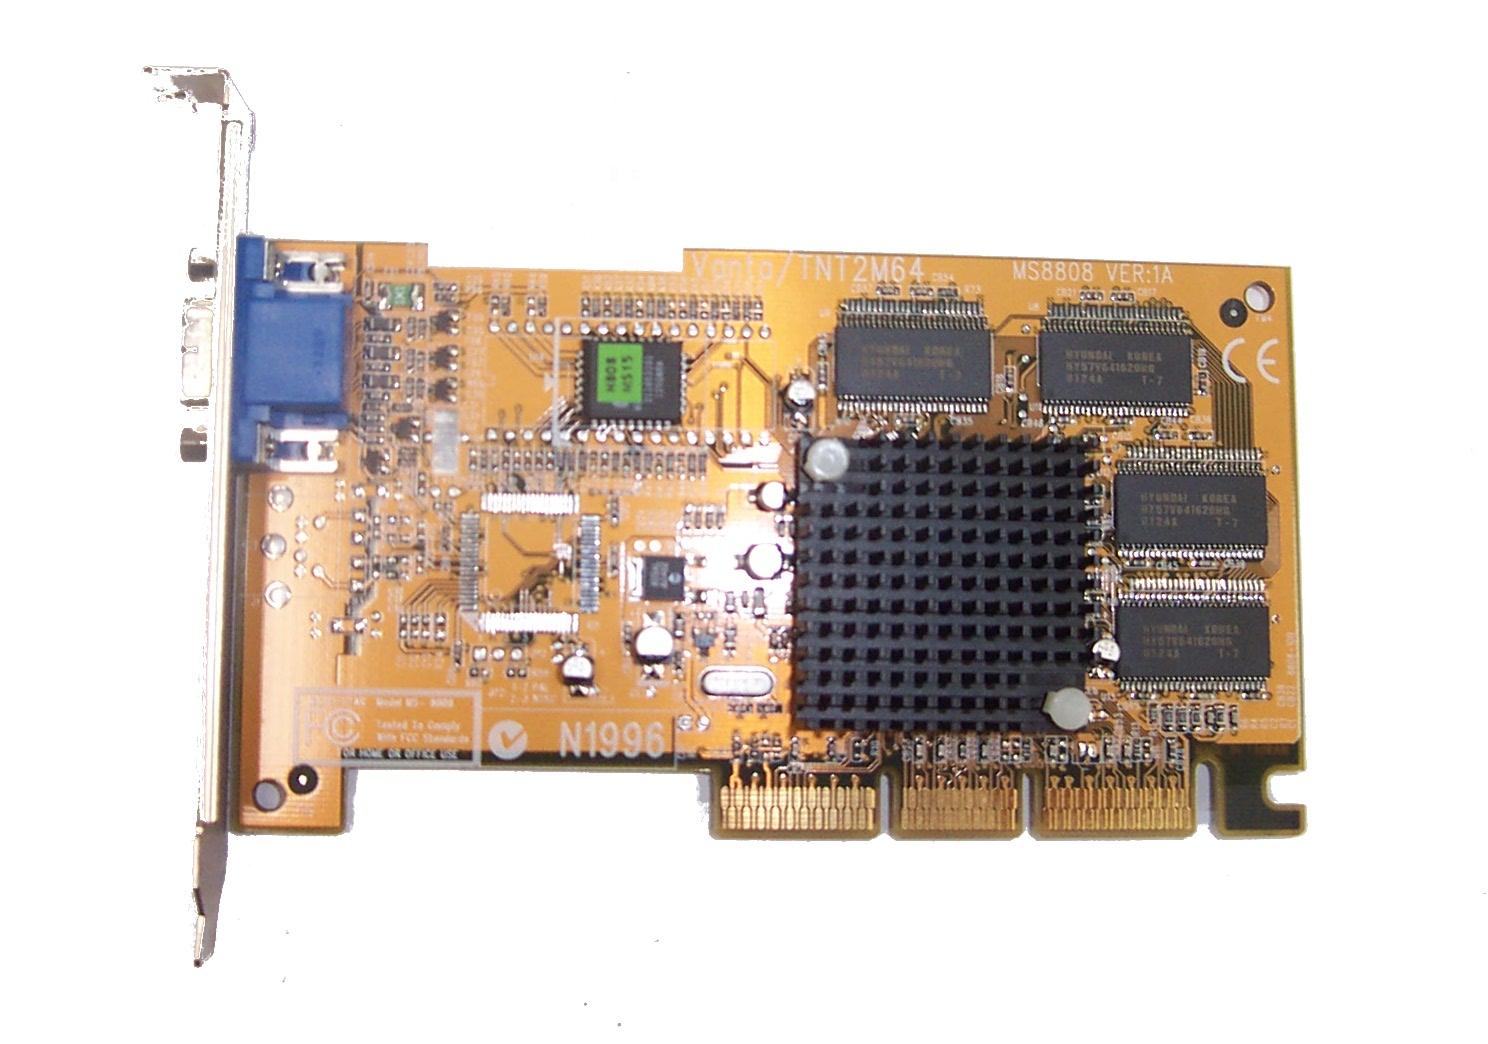 MSI MS-8808 TREIBER WINDOWS 7